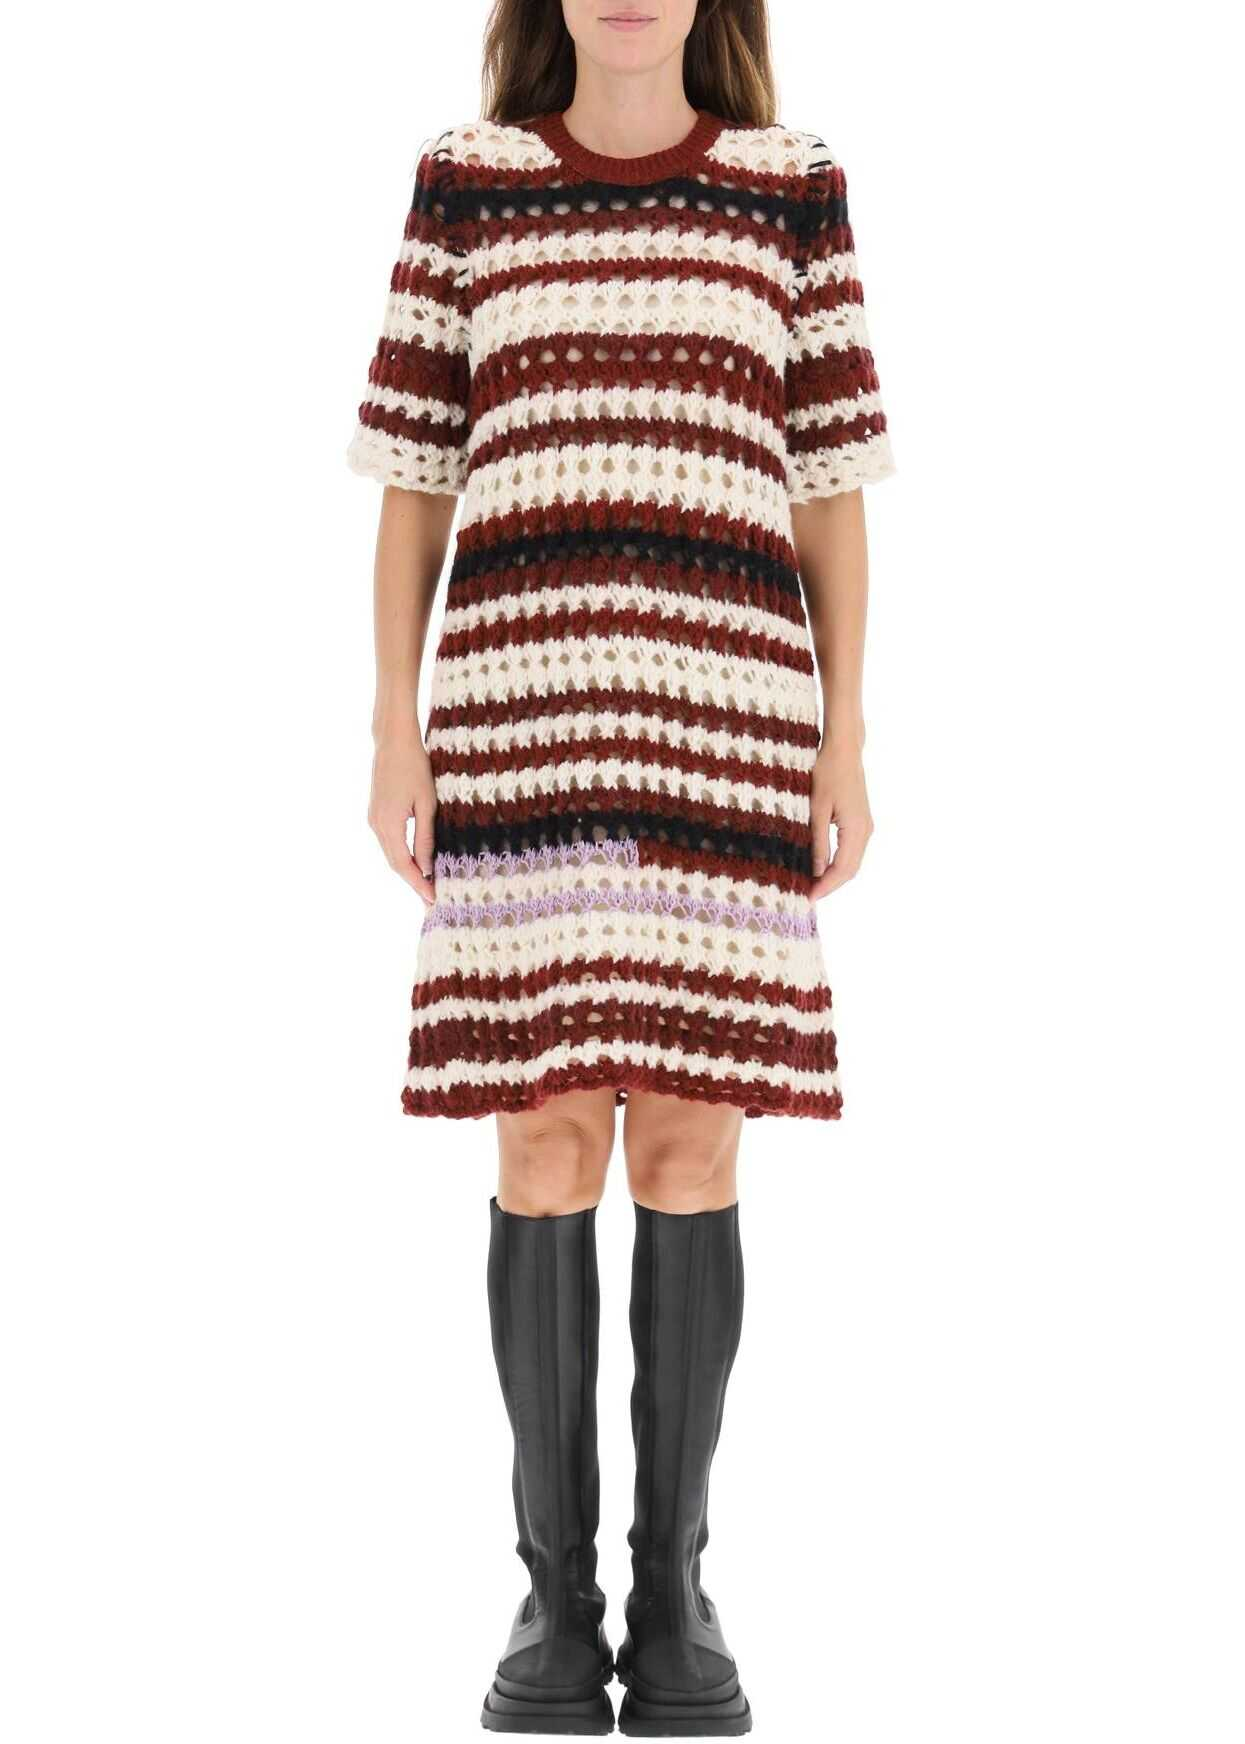 Marni Striped Crochet Dress ABMD0104EQUFW021 BURGUNDY image0